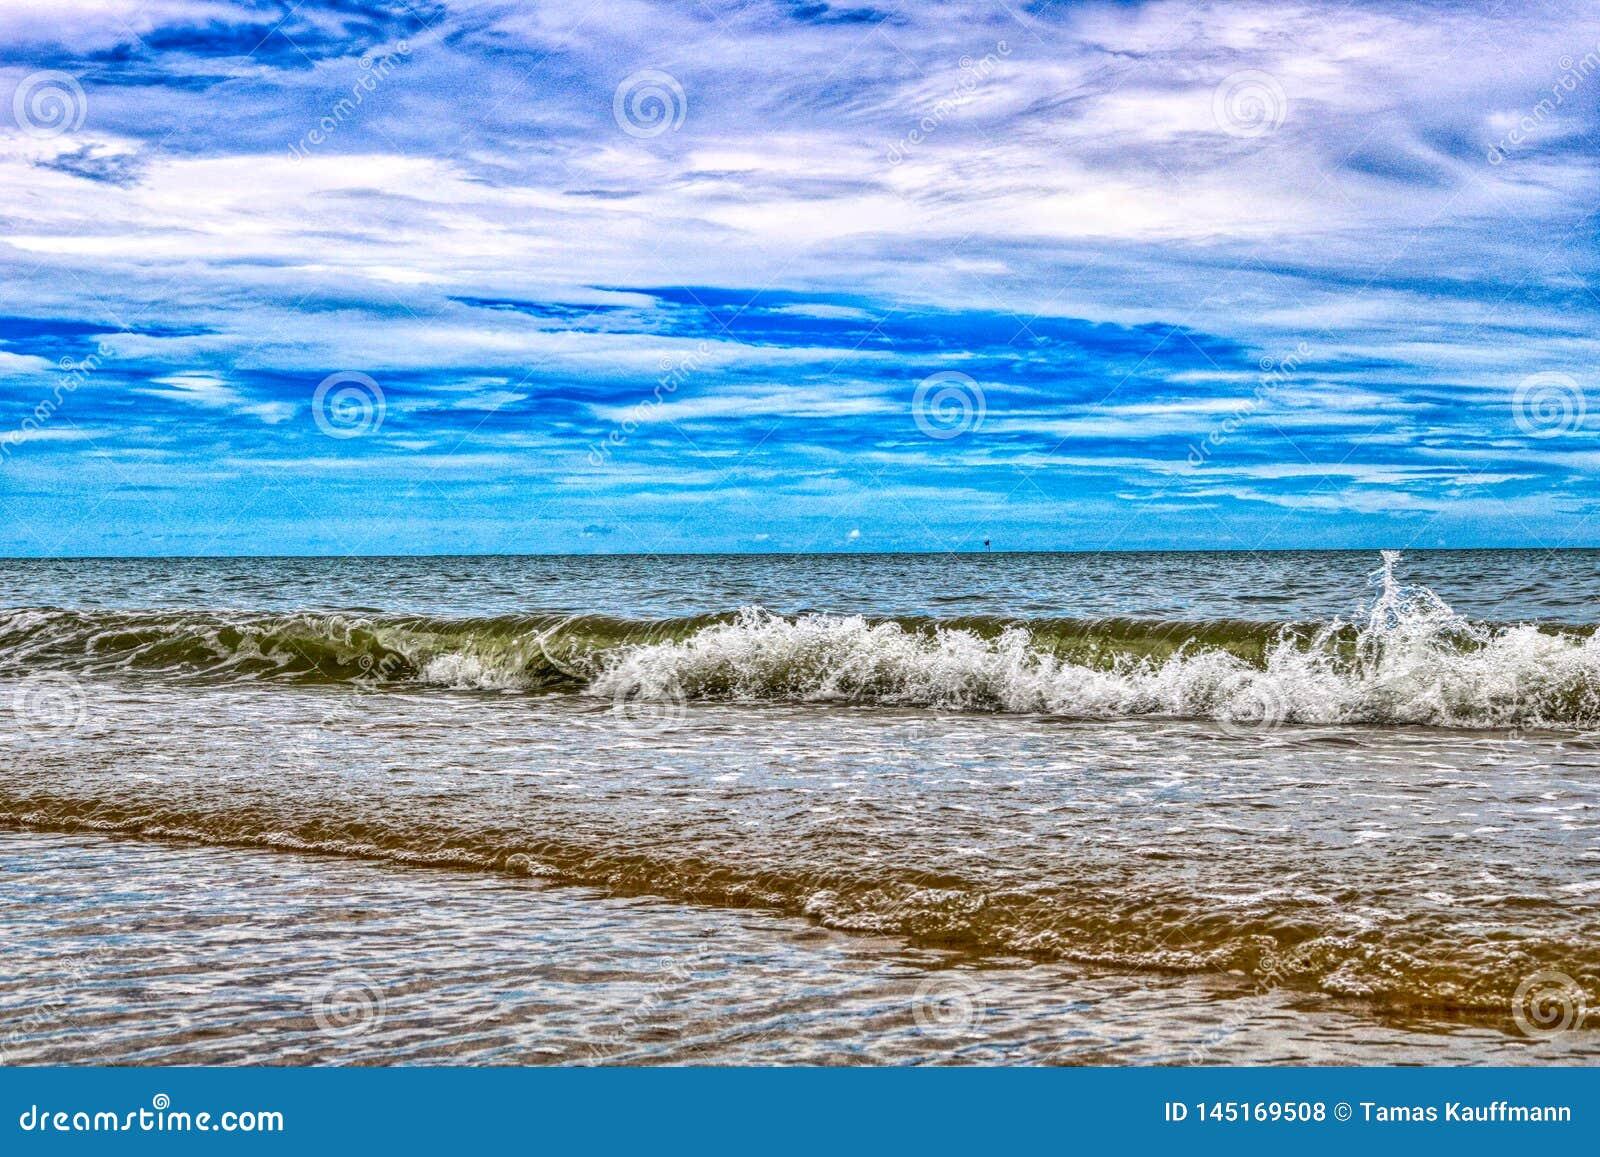 The natural beach of Ban Krut in Thailand